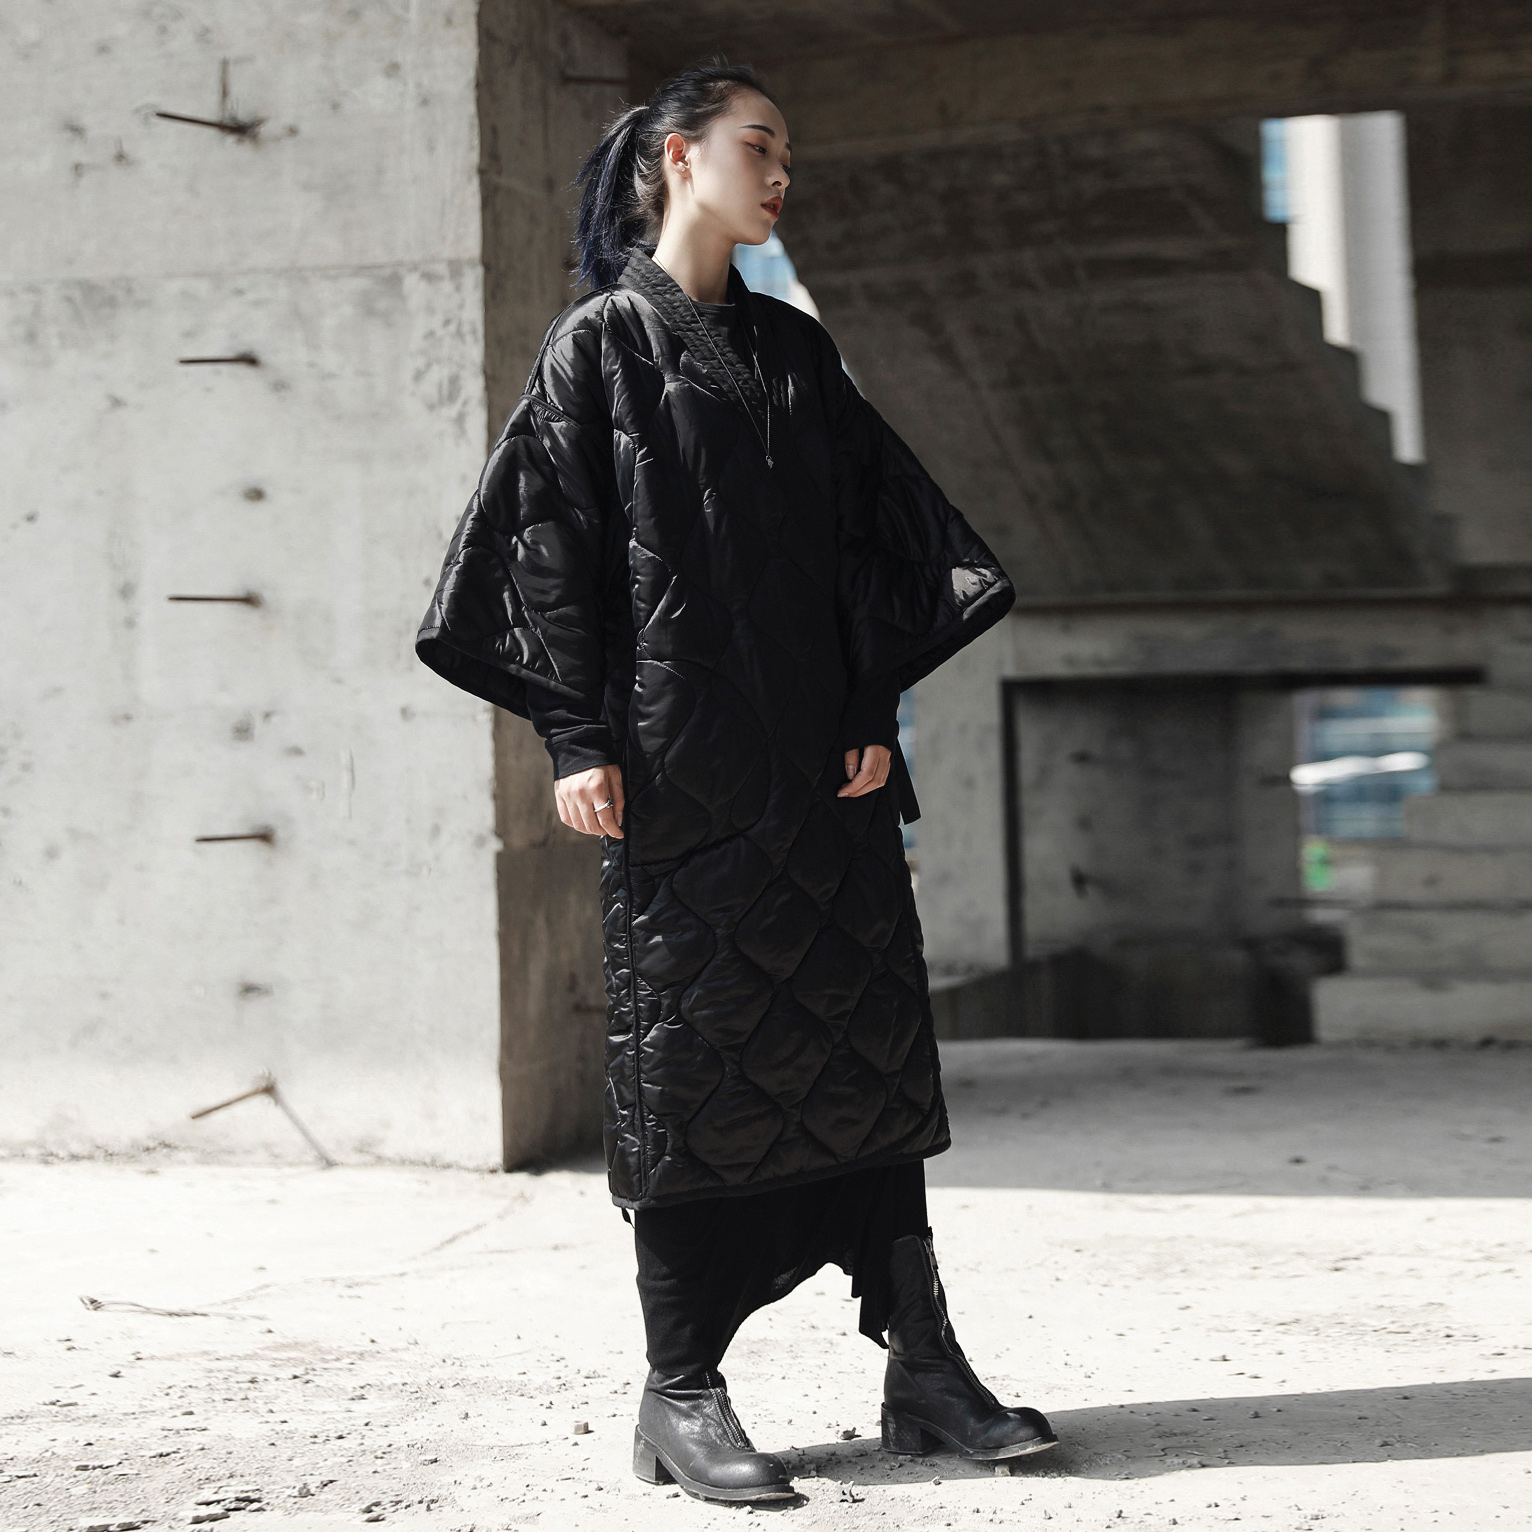 f6ffce6caeac58 NANASTYLE-Femmes-Hiver-Mode-Casual-Designer-Pardessus-Surv-tement-Kimono-Robe-Blousons-Coton-Rembourr-Longue.jpg